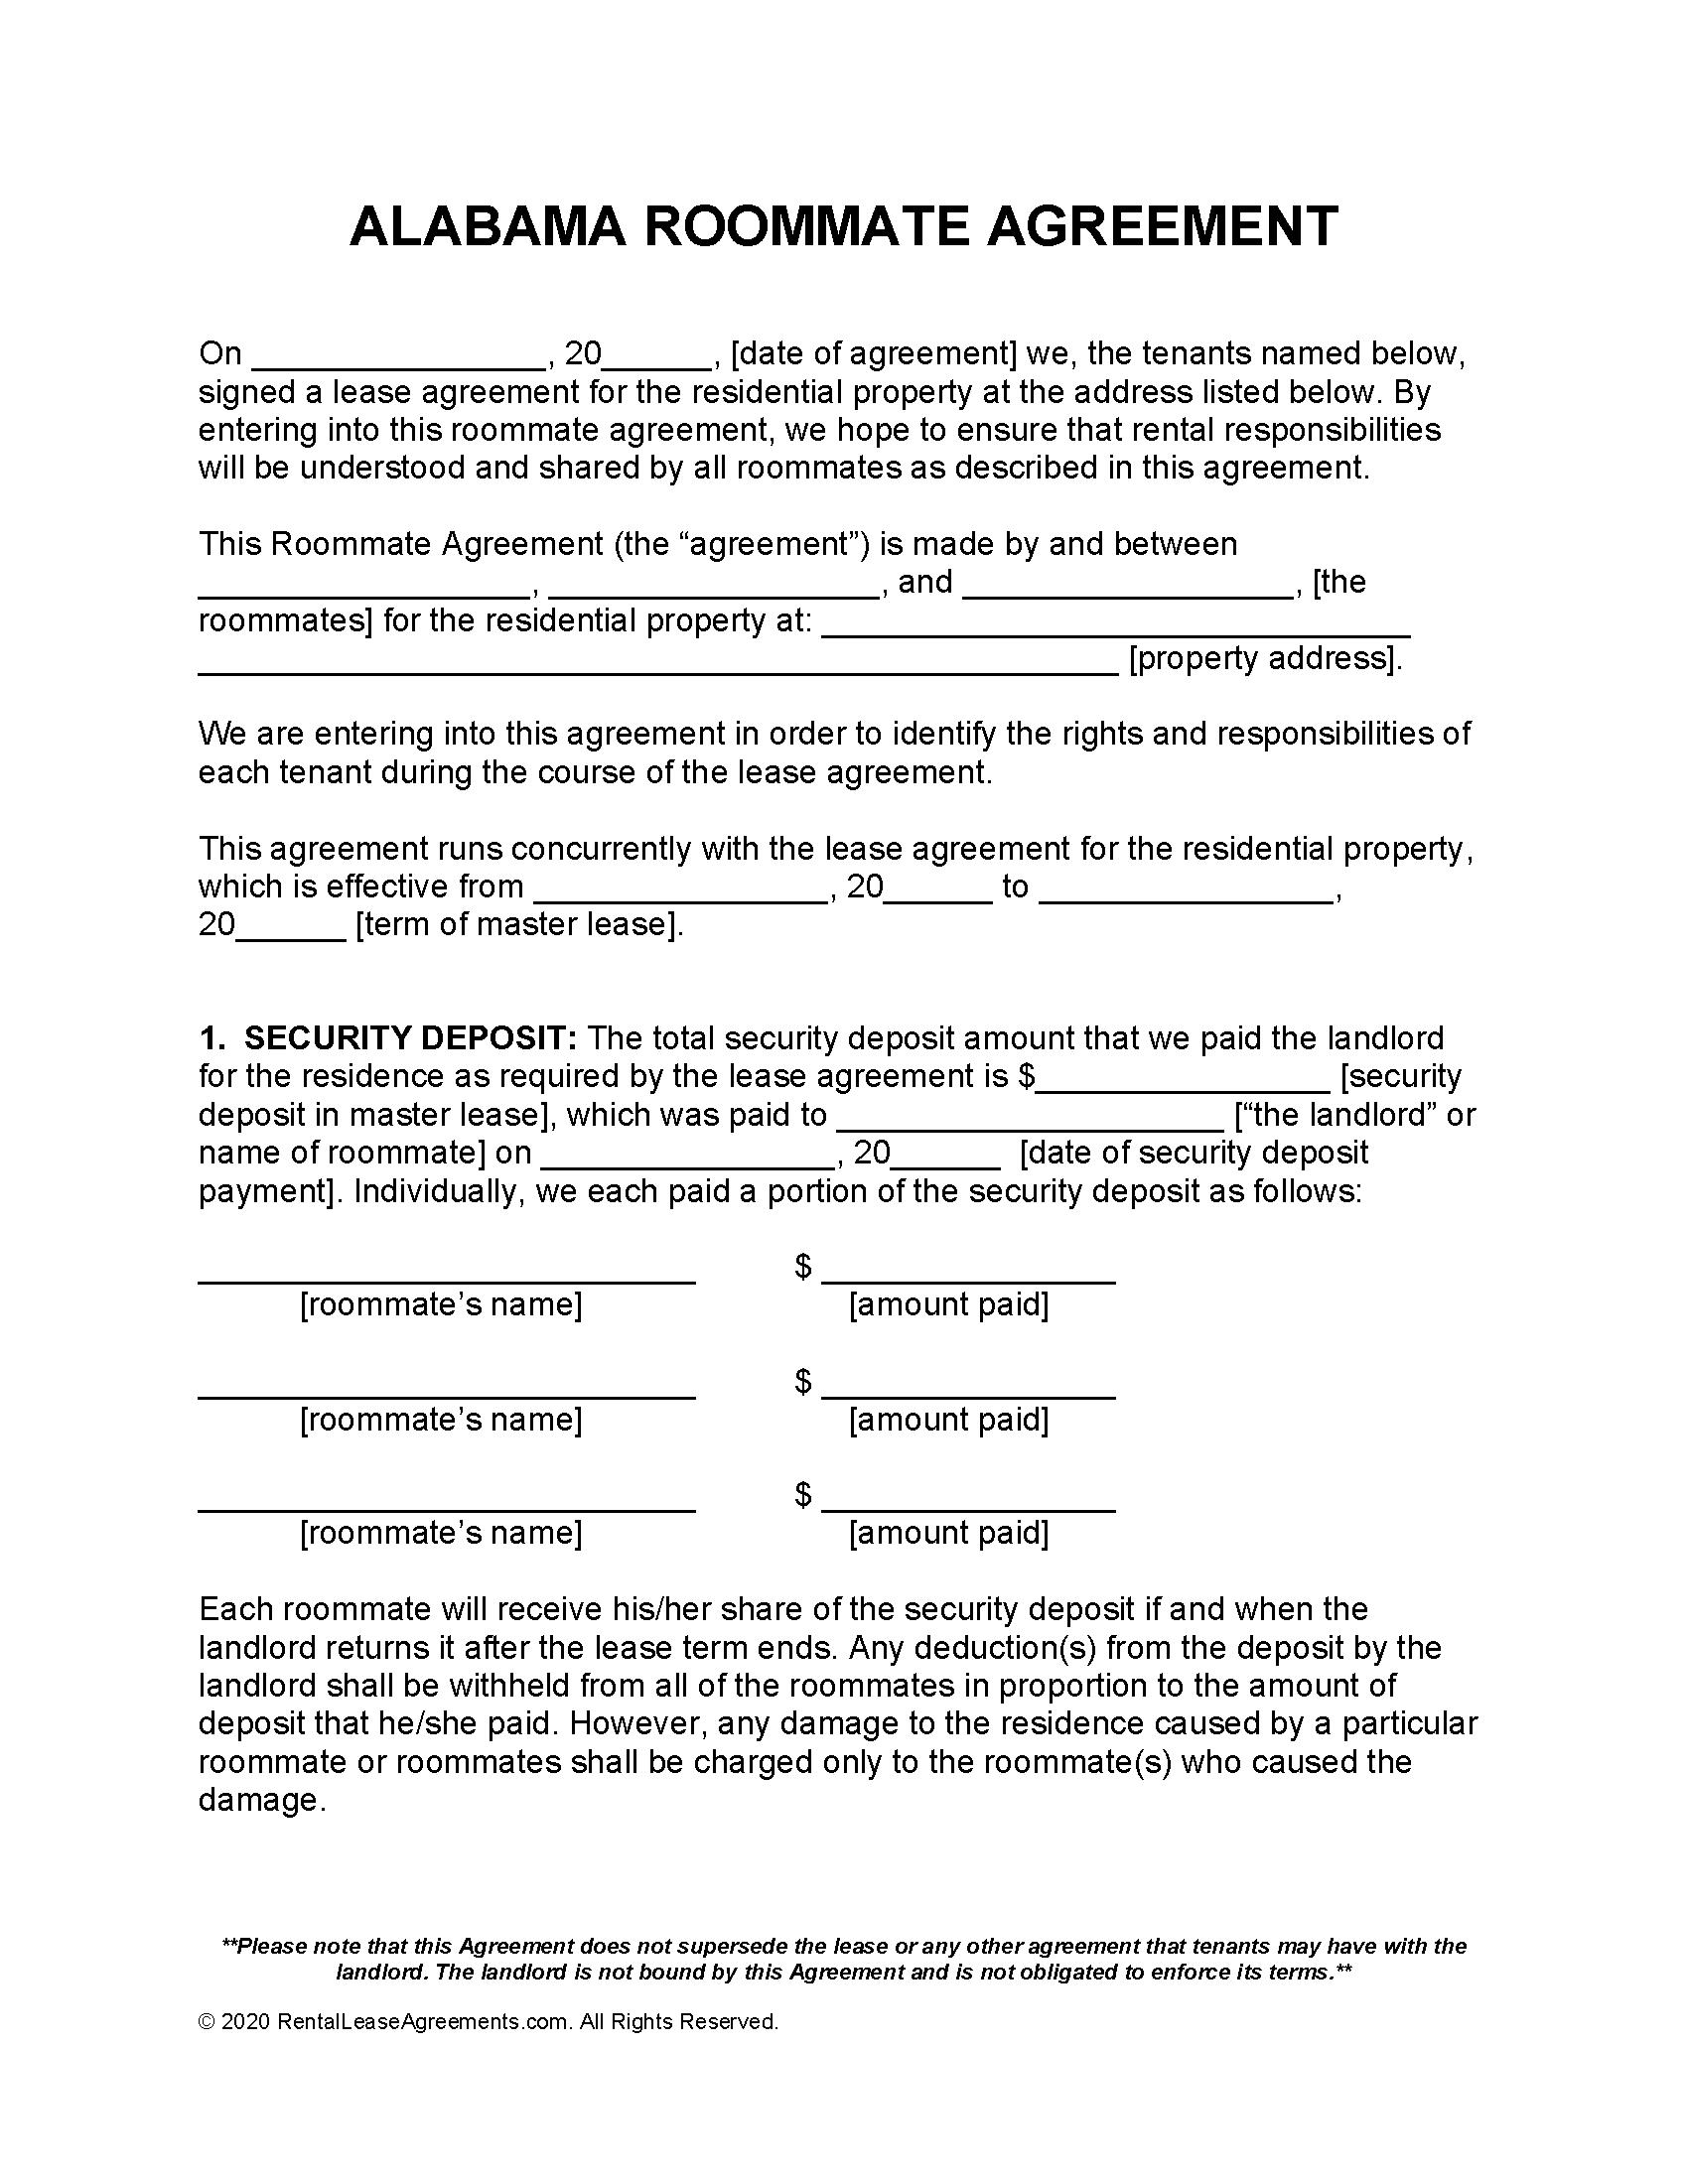 Free Alabama Roommate Agreement Template - PDF - Word